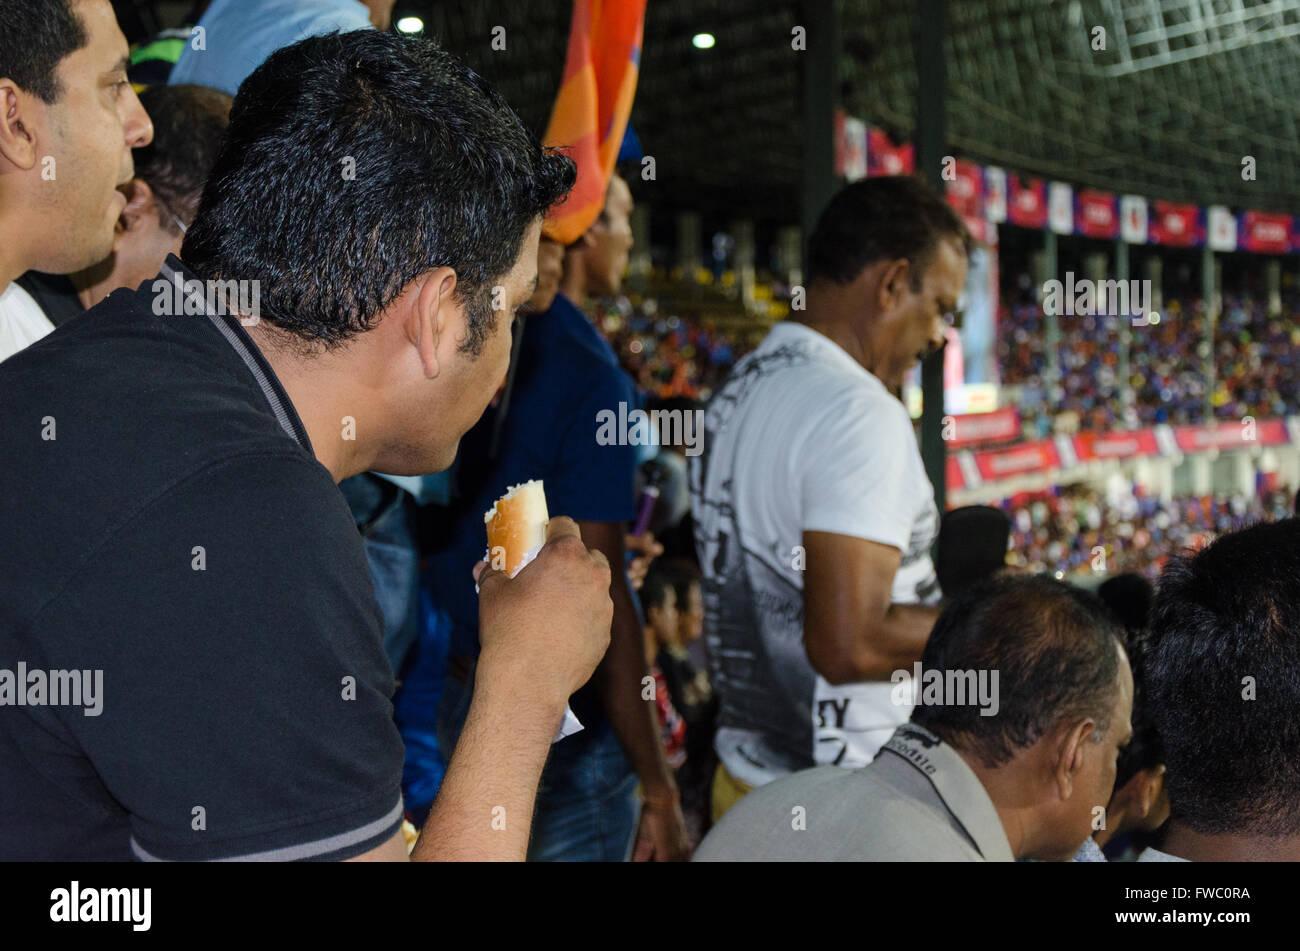 A spectator eats sandwich during halftime of FC Goa vs Atlético de Kolkata ISL match on October 7, 2015 in - Stock Image